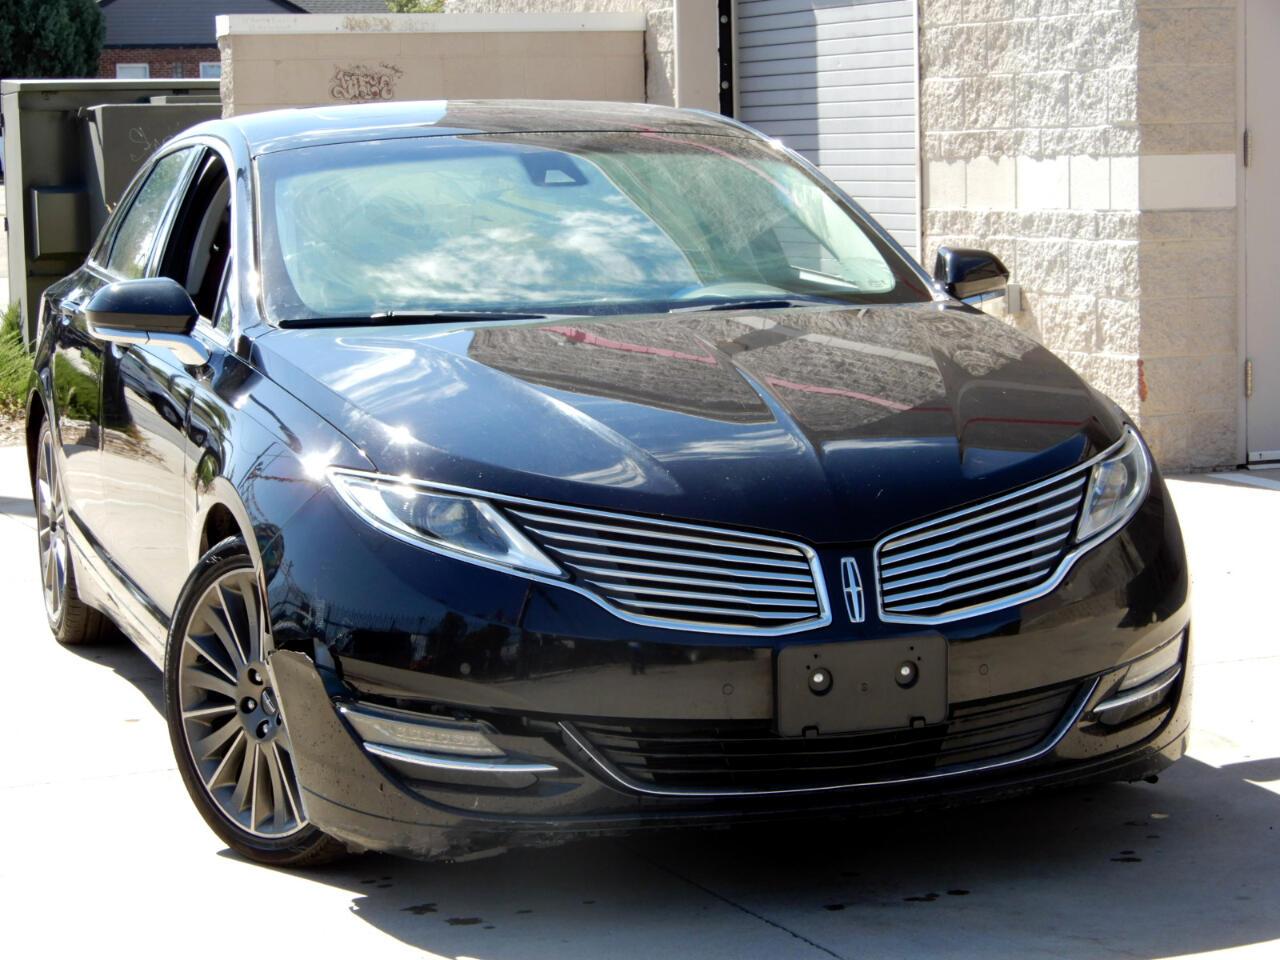 Lincoln MKZ 4dr Sdn Hybrid FWD 2016